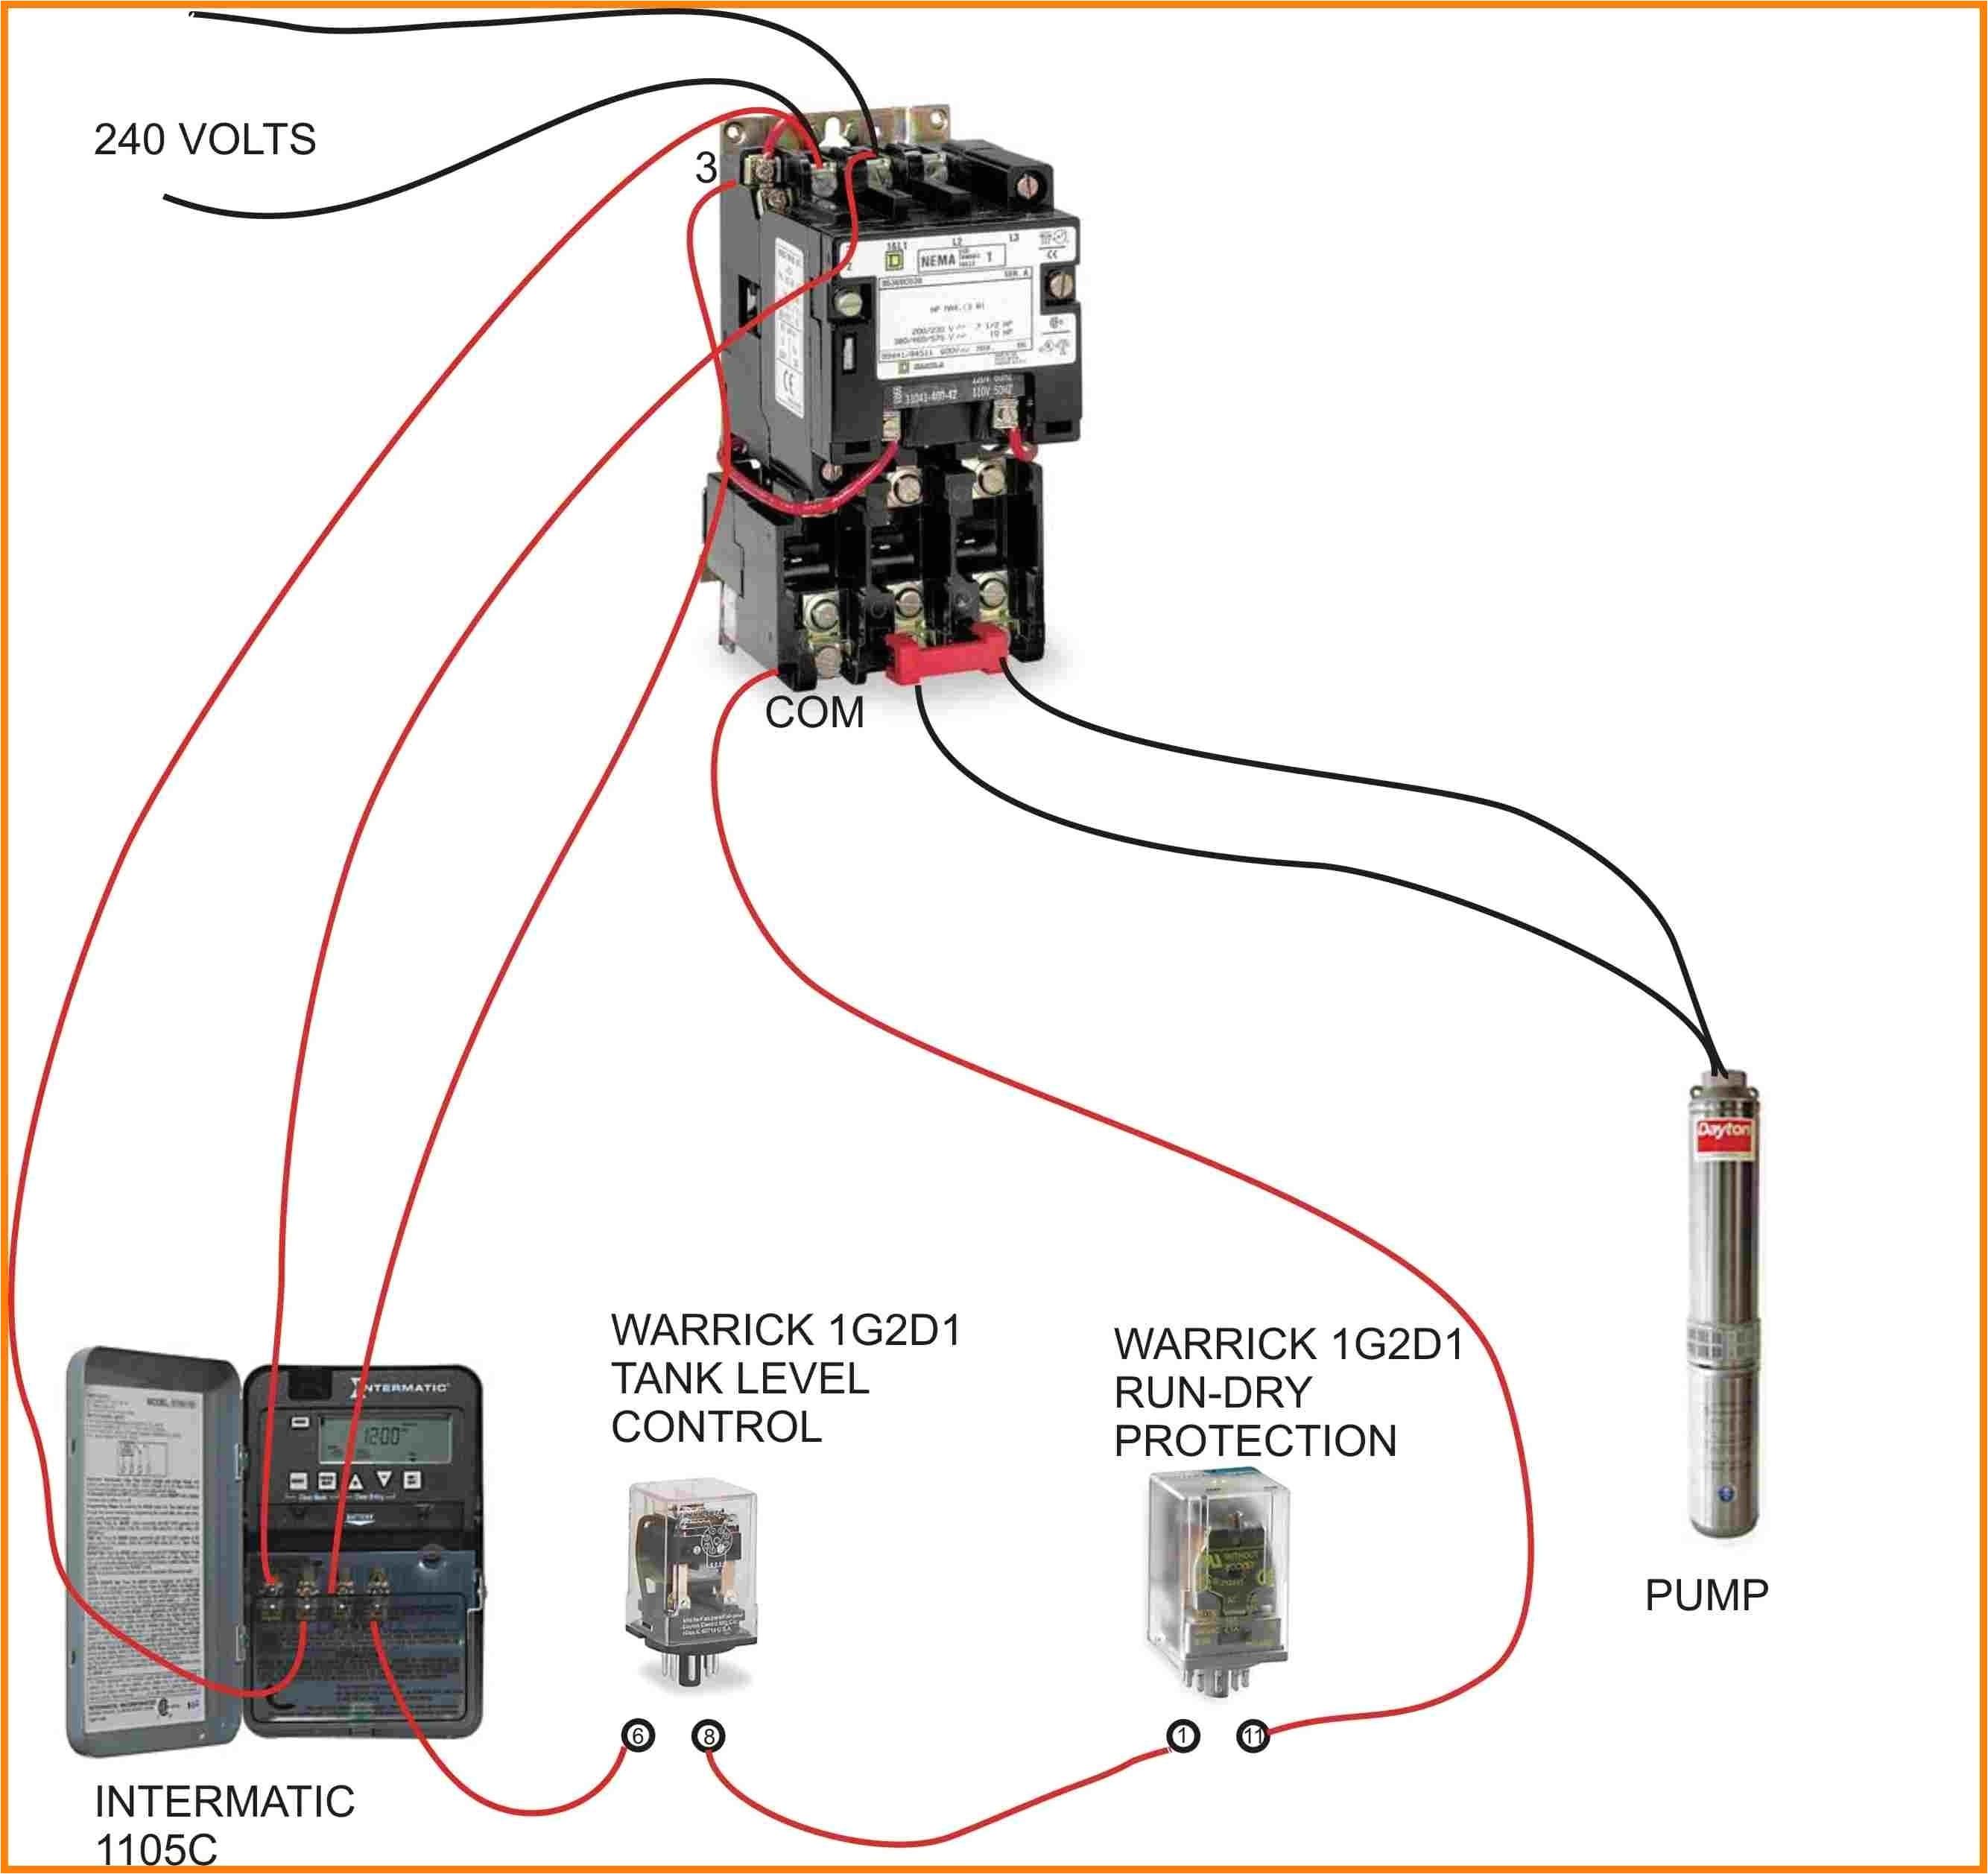 electric contactor diagram wiring diagram insideelectrical contactor diagram wiring diagram inside electric contactor wiring diagram electric